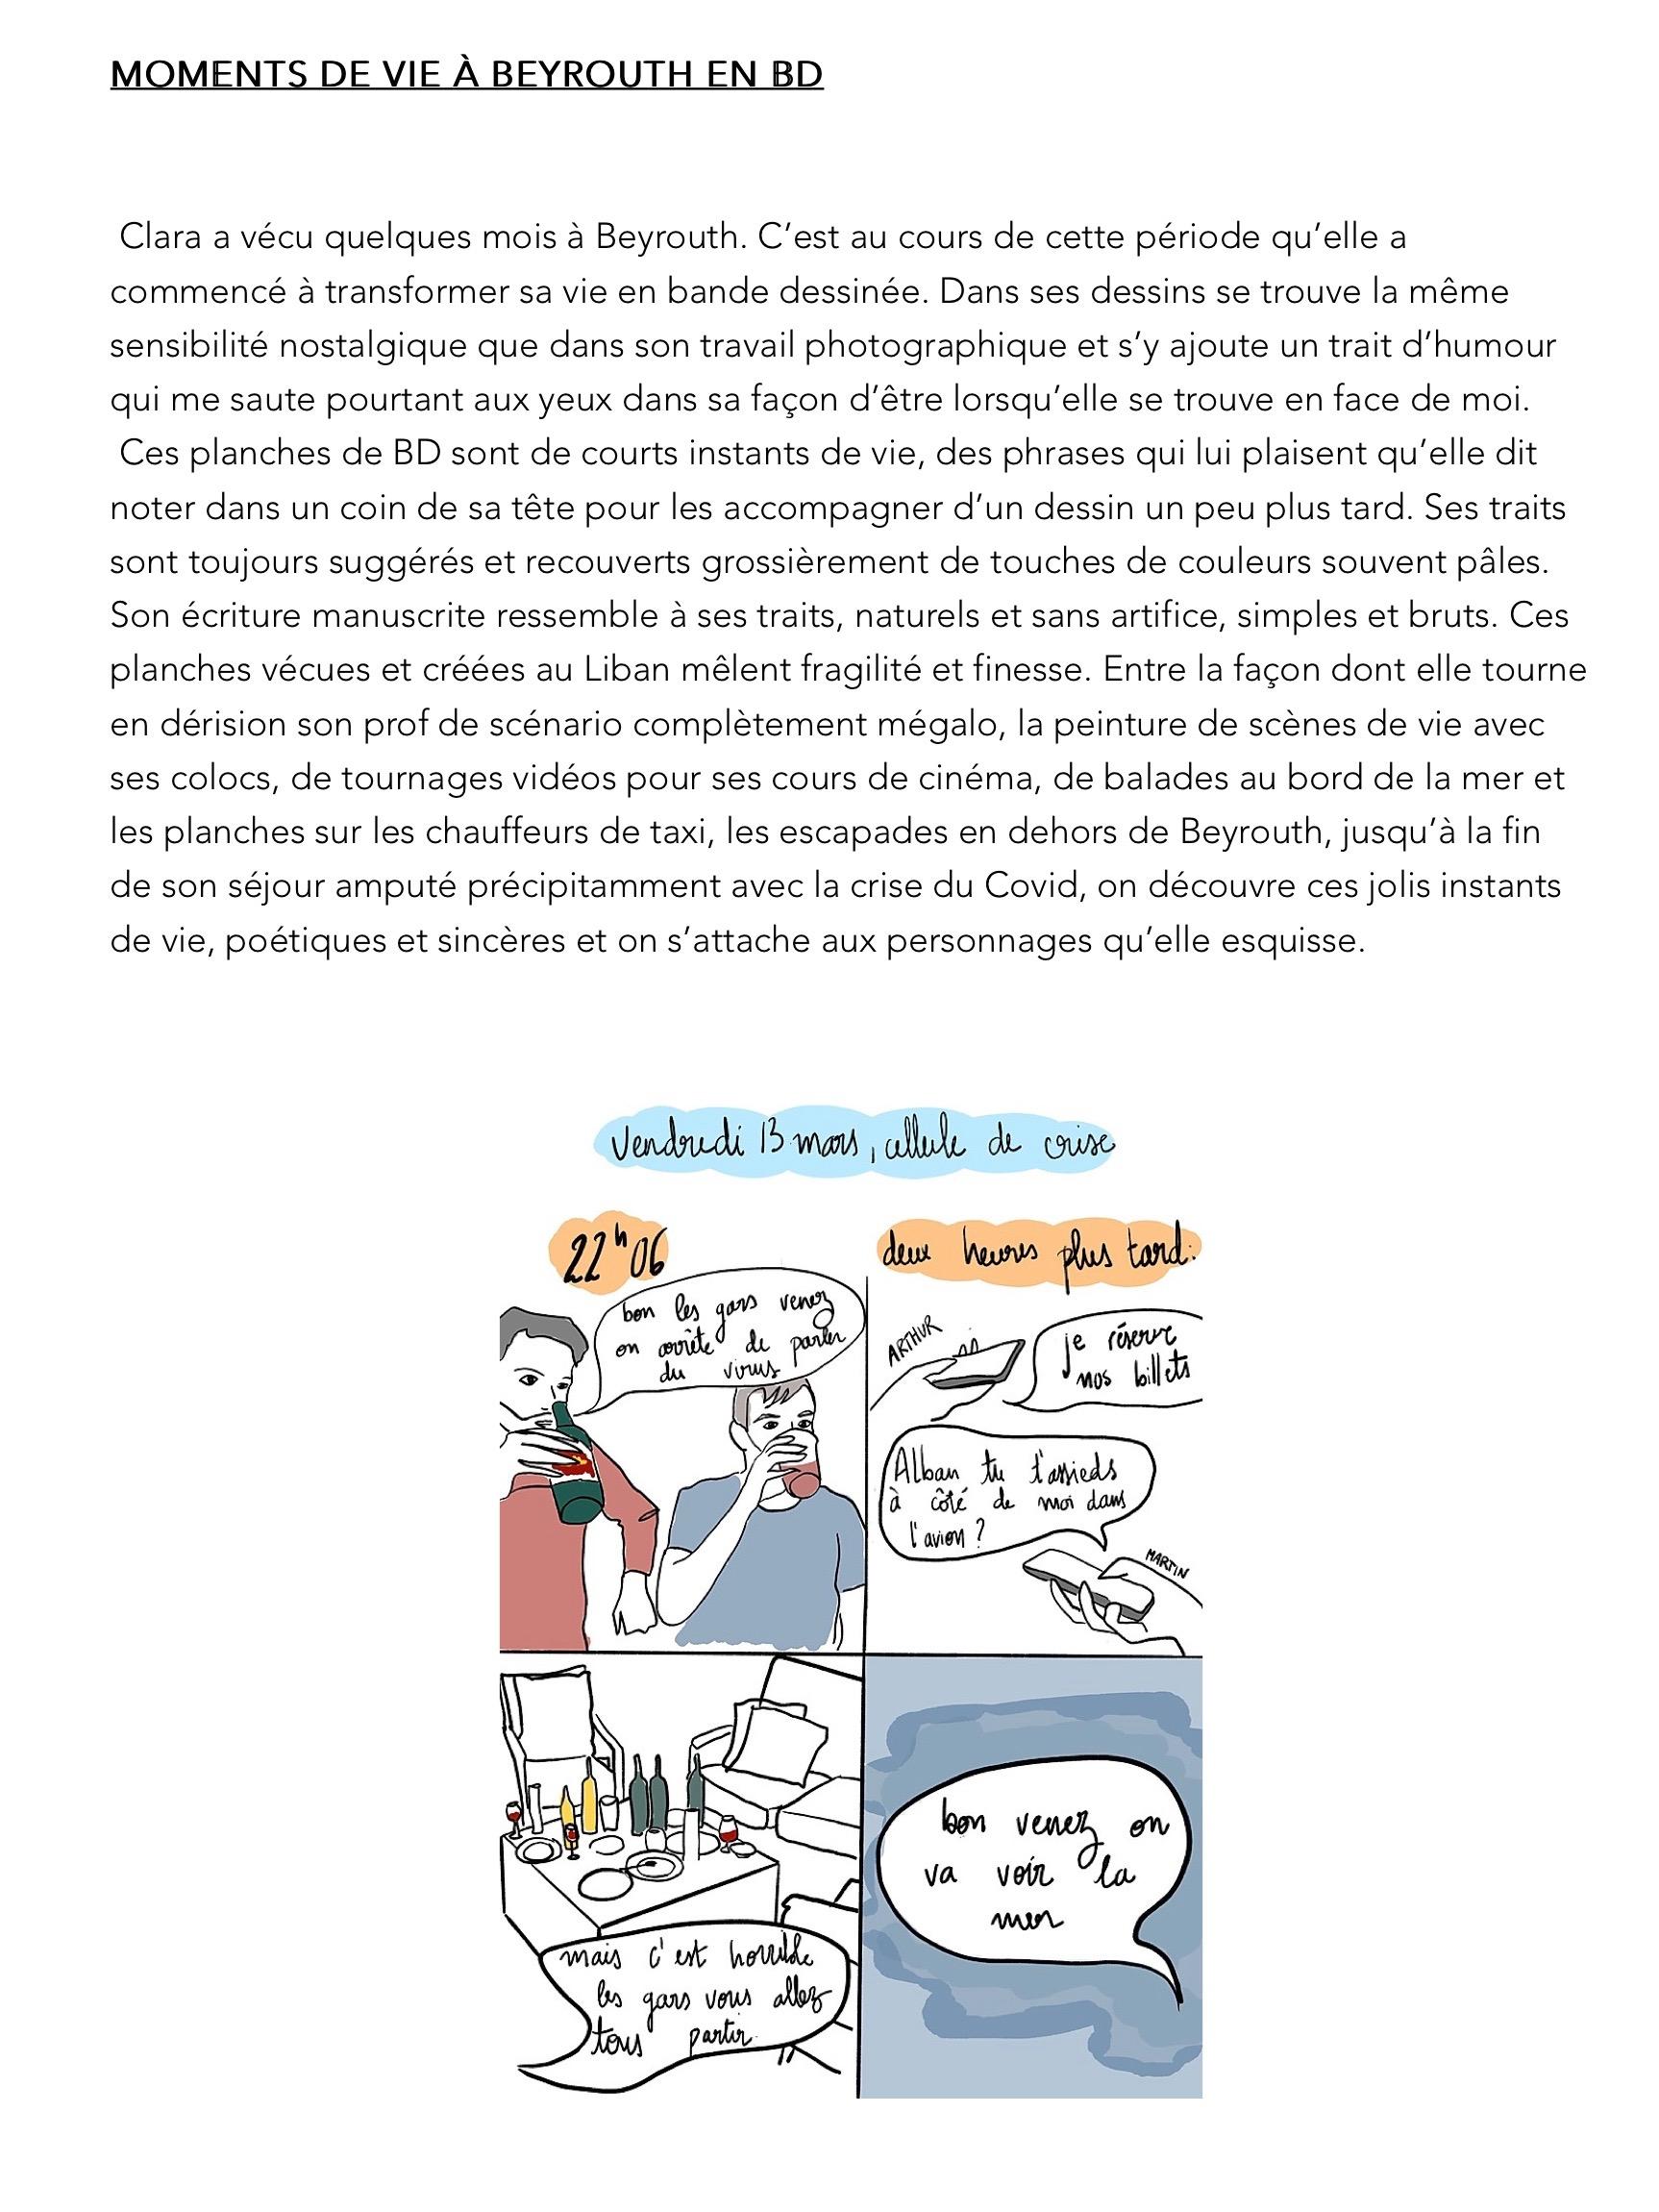 CLARA KENNEDY, POÈTE DU SOUVENIR copie 4